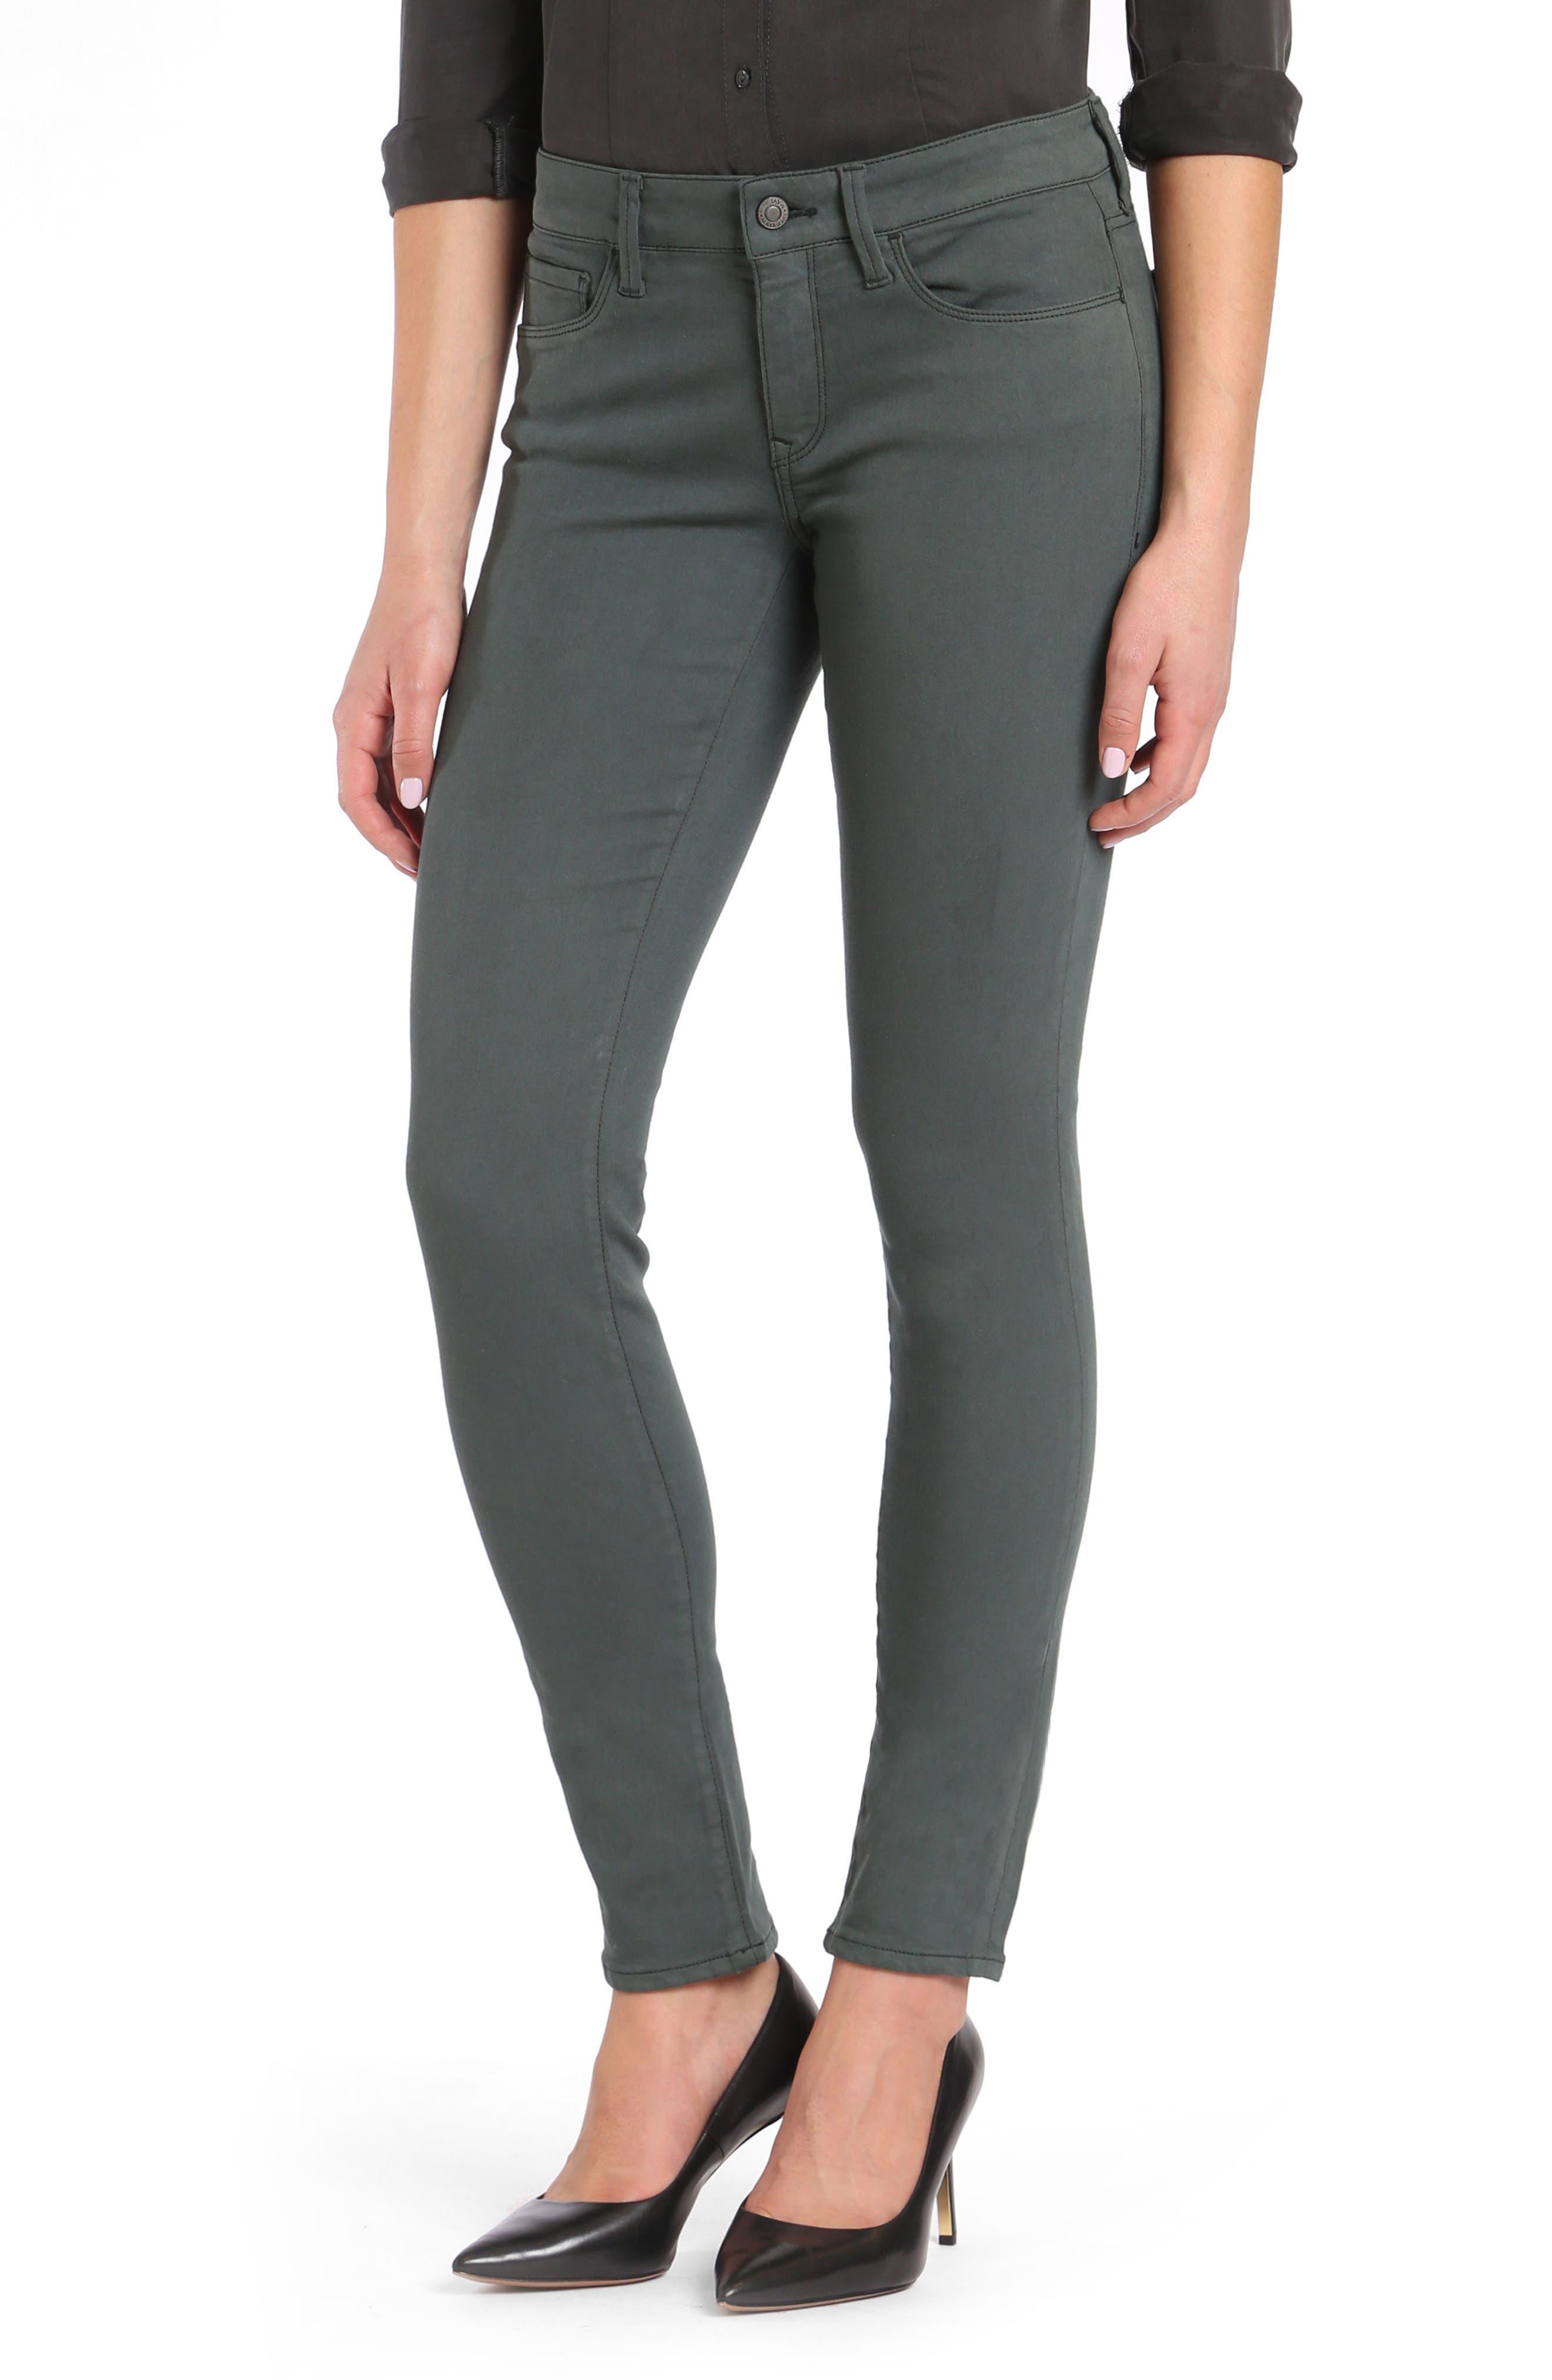 Mavi Jeans Adriana Skinny Twill Pants